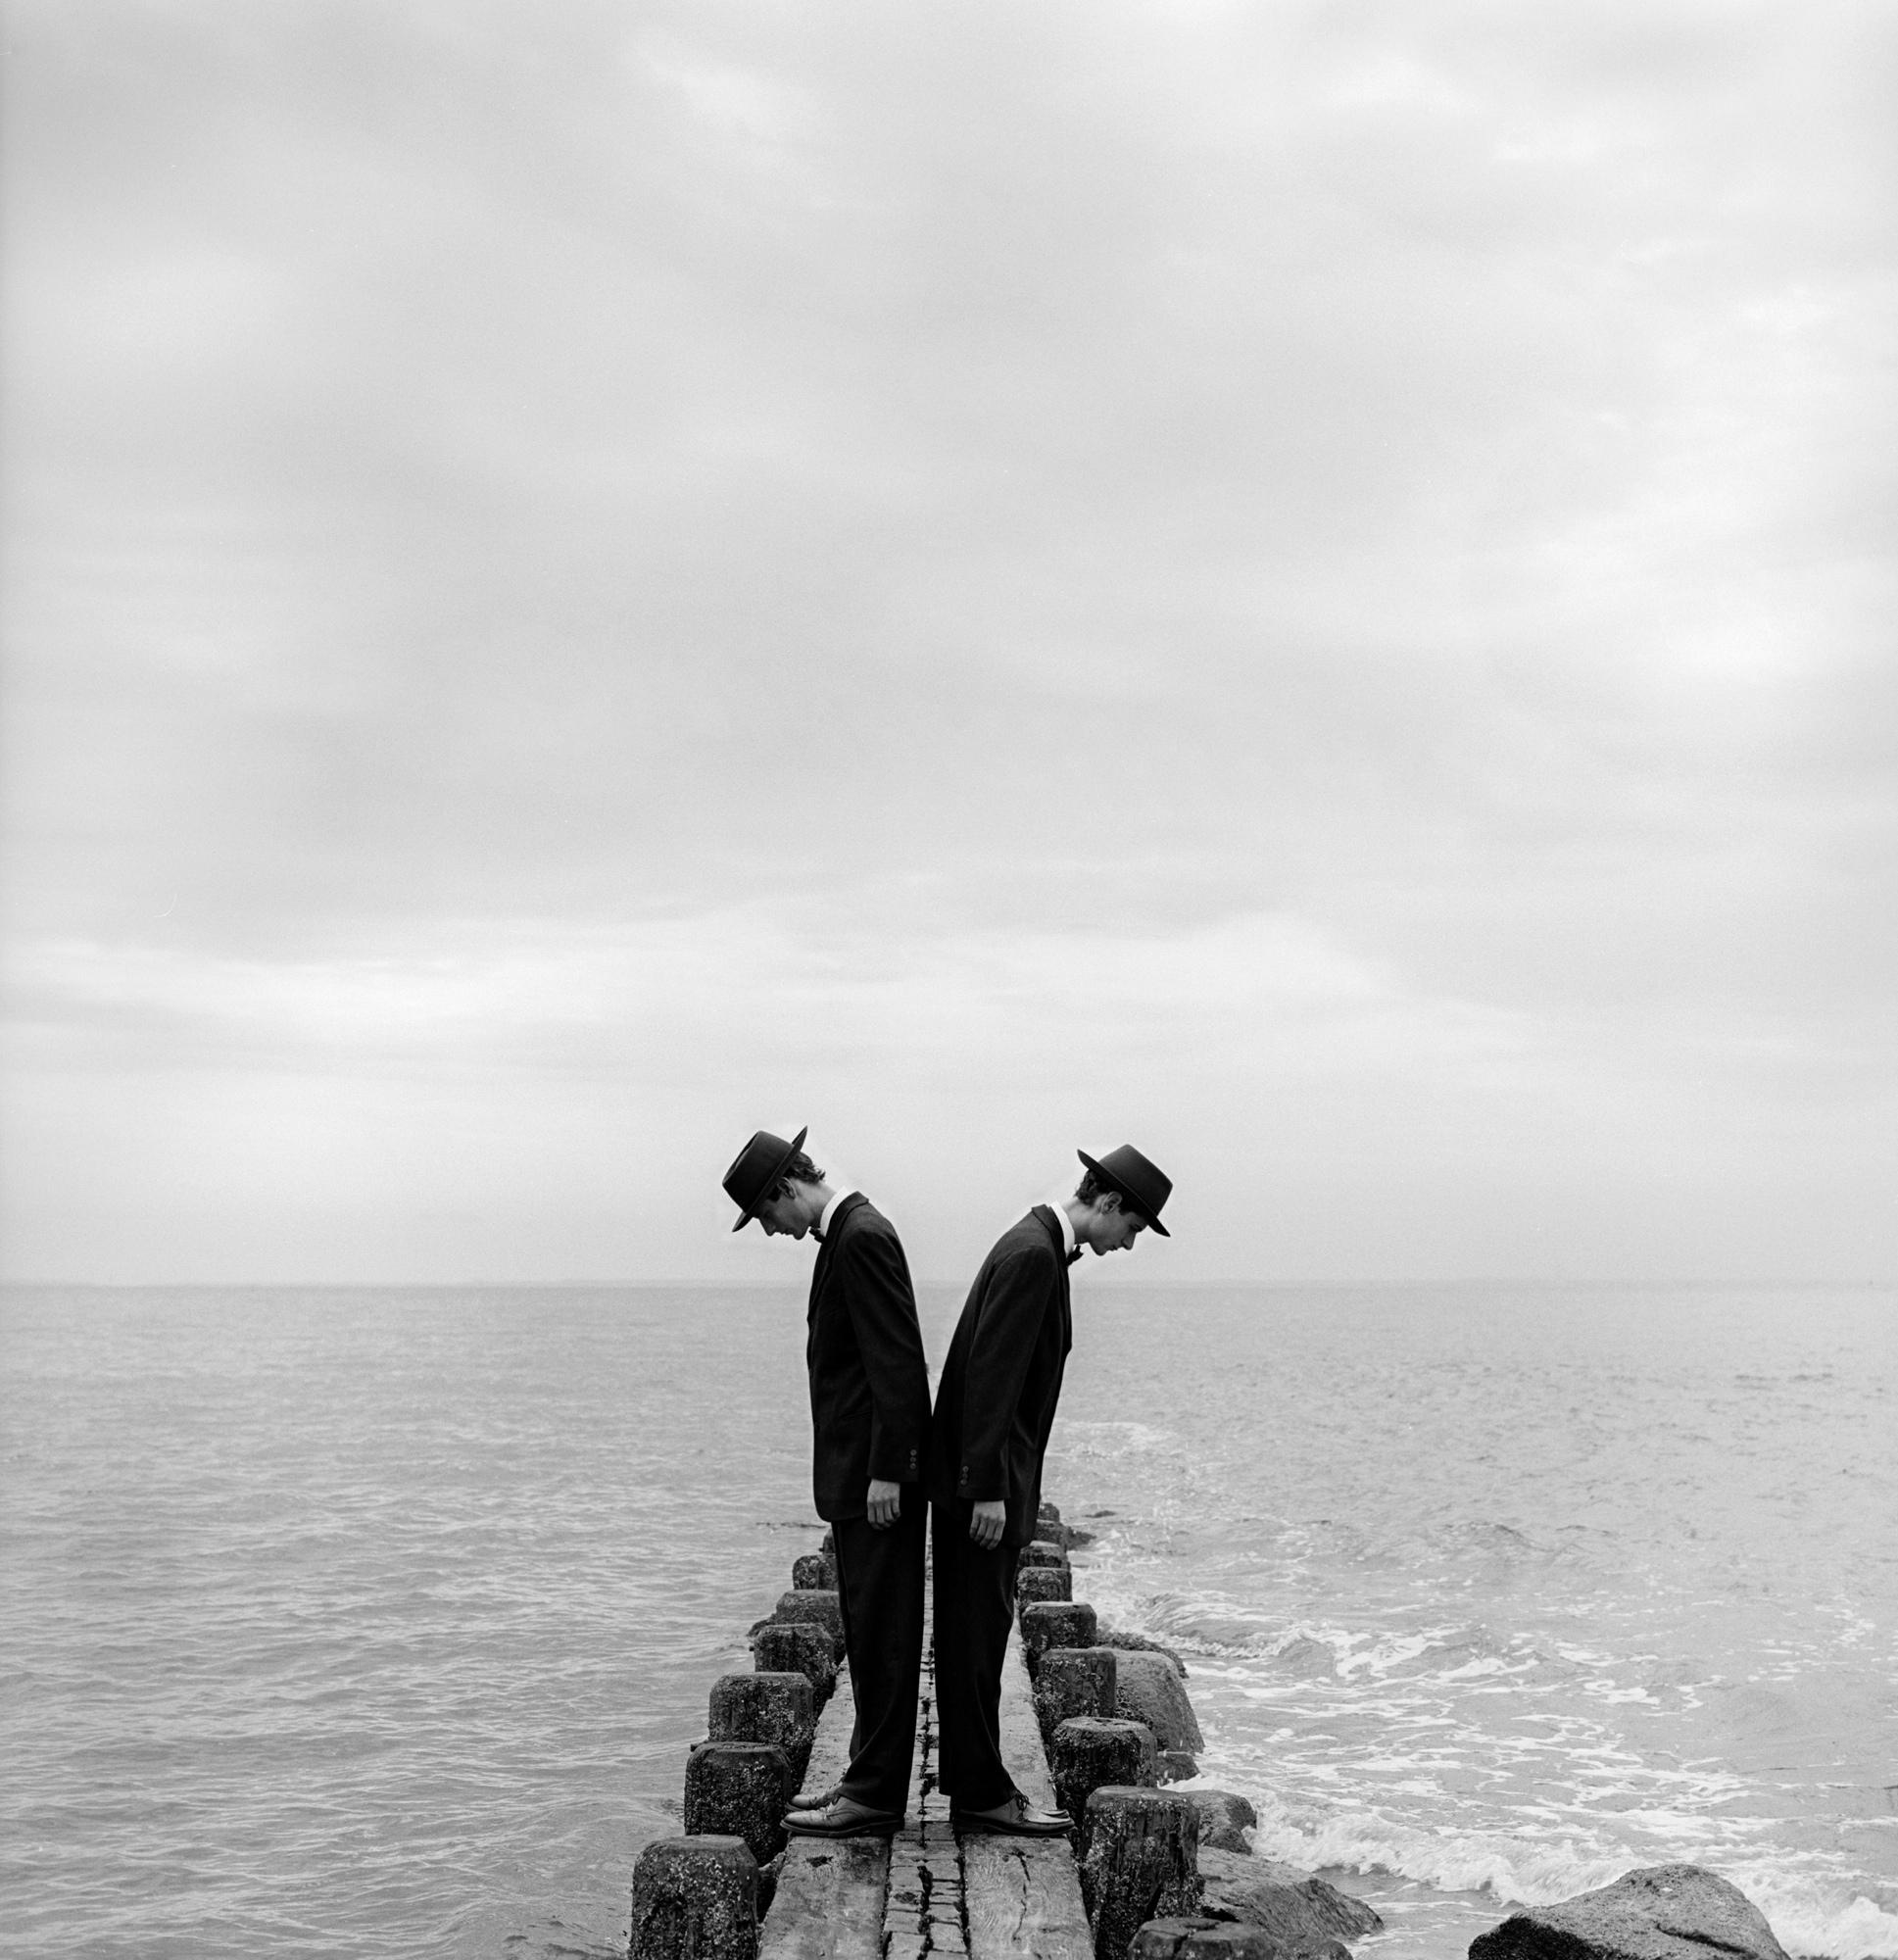 Twins Leaning Outward on Dockno.1, Sherwood Island, CT  1997 Silver gelatin print 27 x 27 cm (image) 56 x 66 cm (mount)